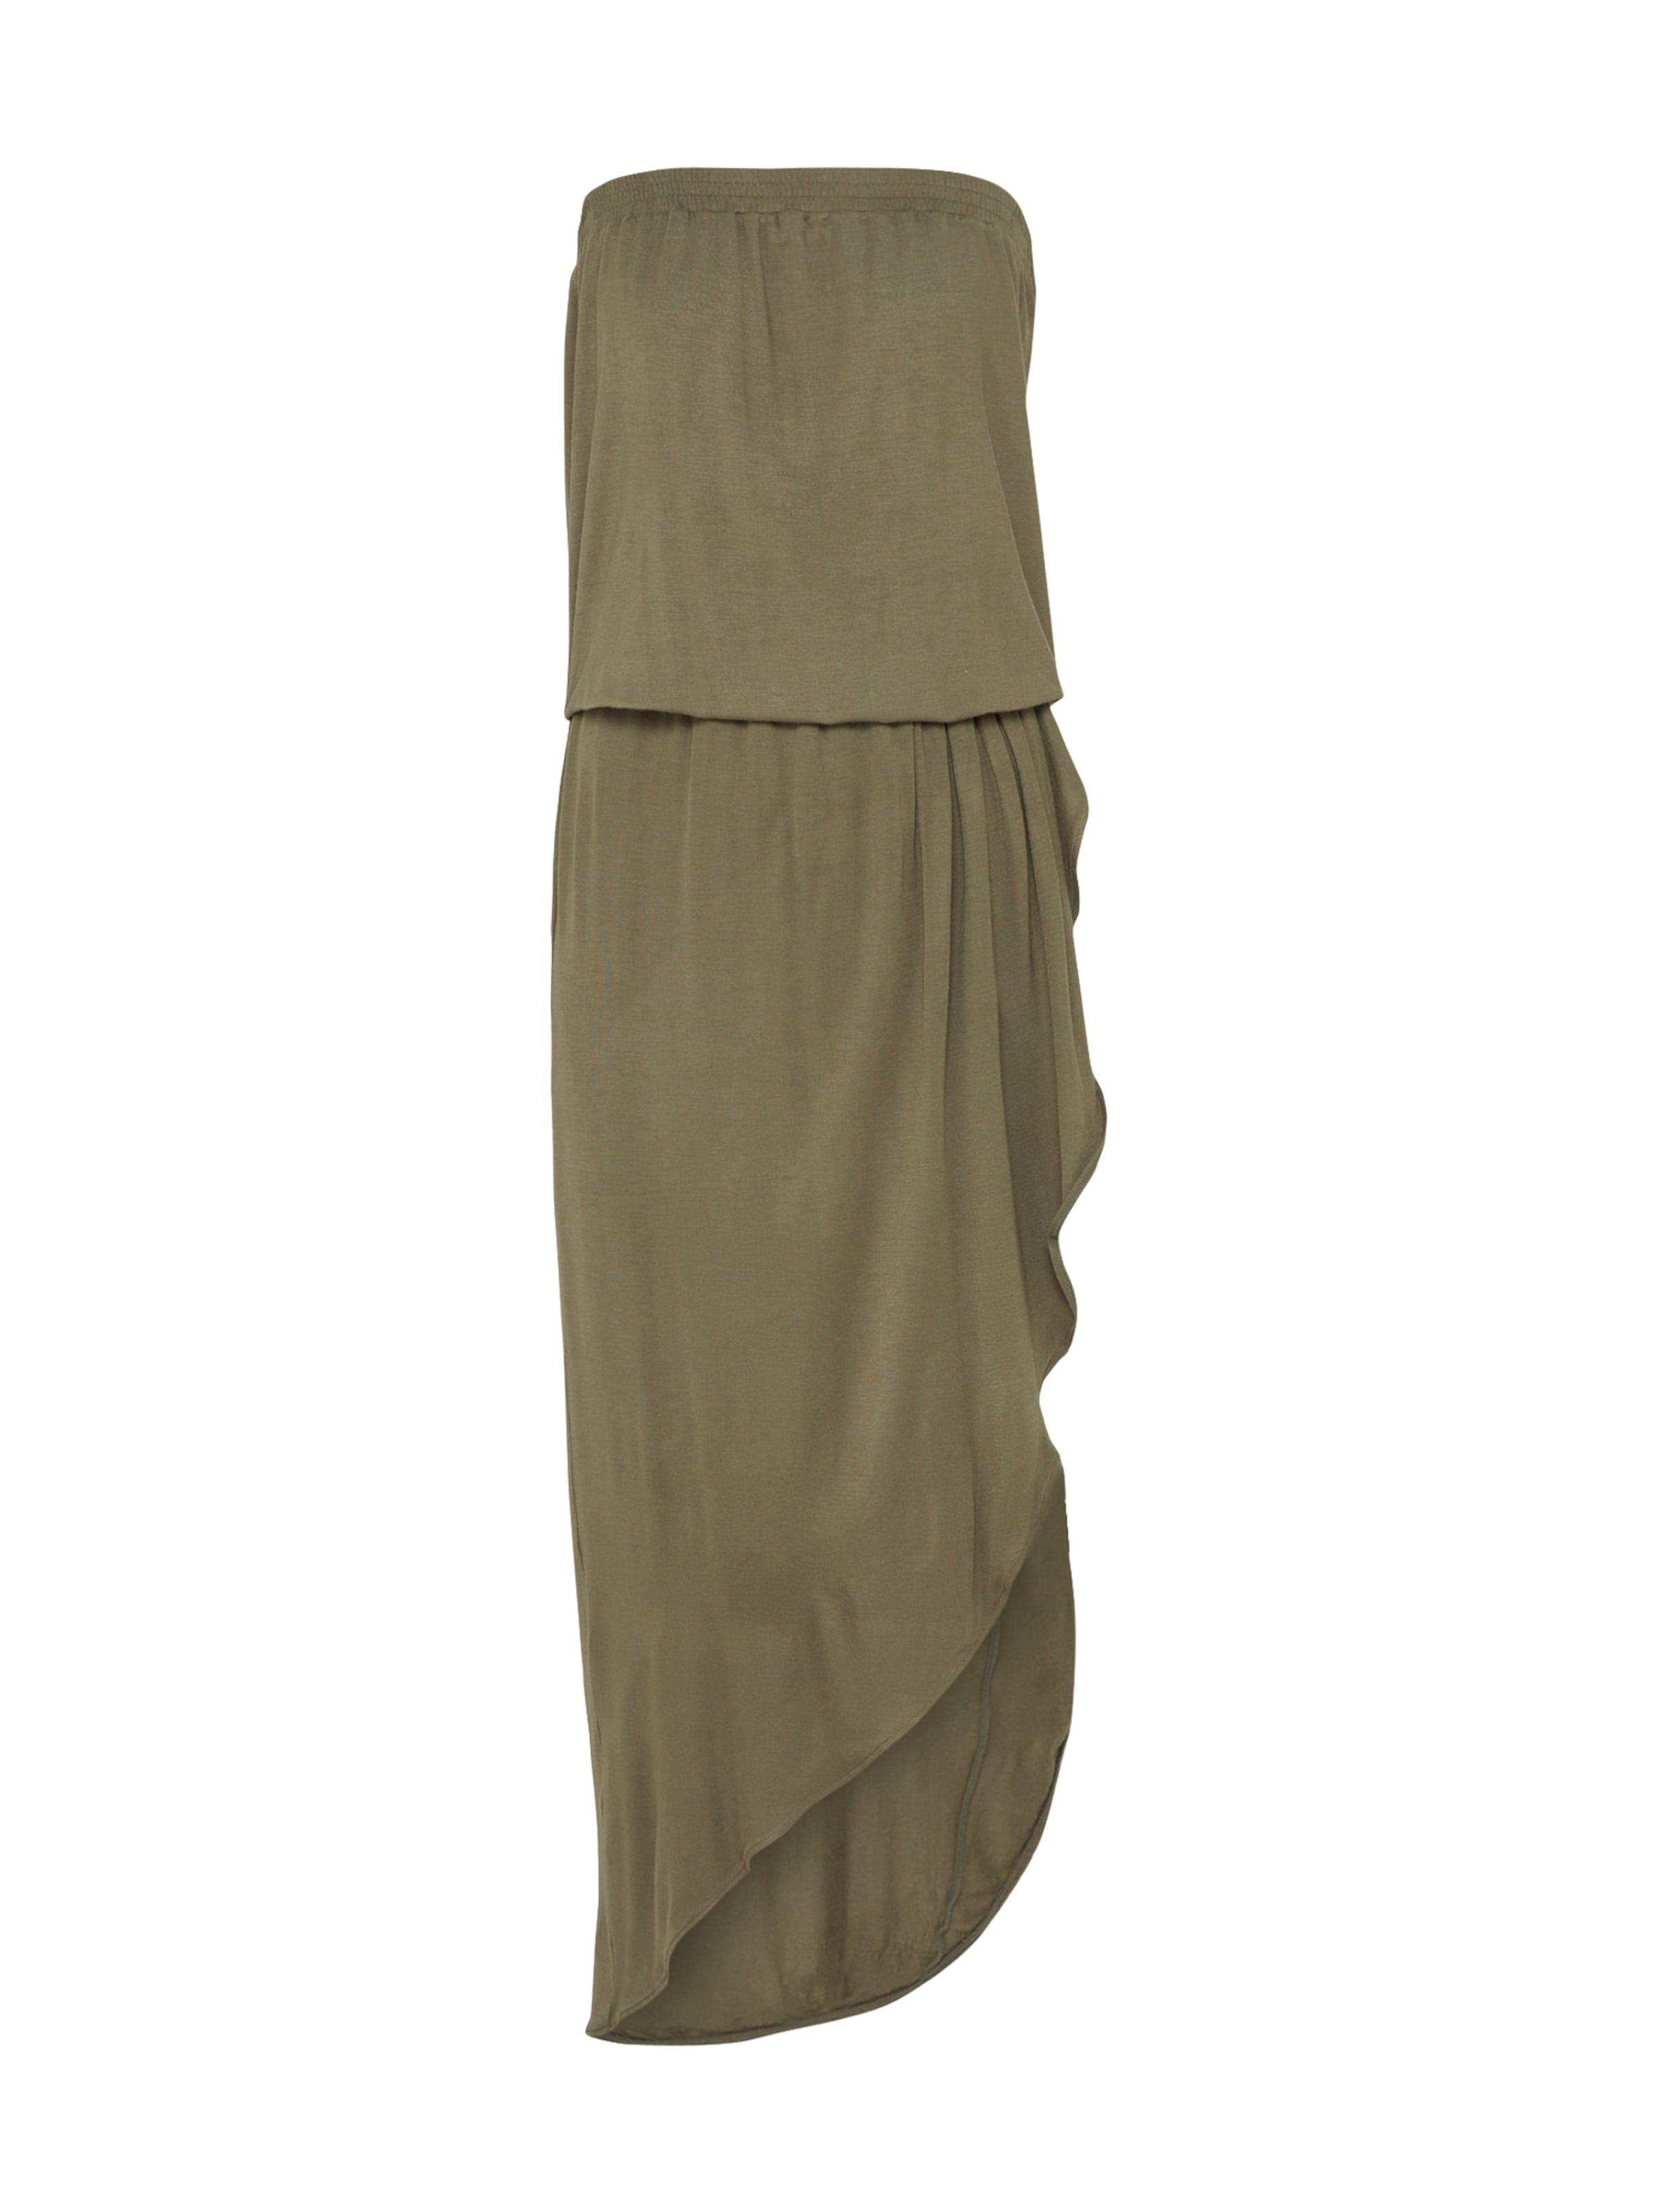 En Robe Urban Classics Olive D'été A354qRjL